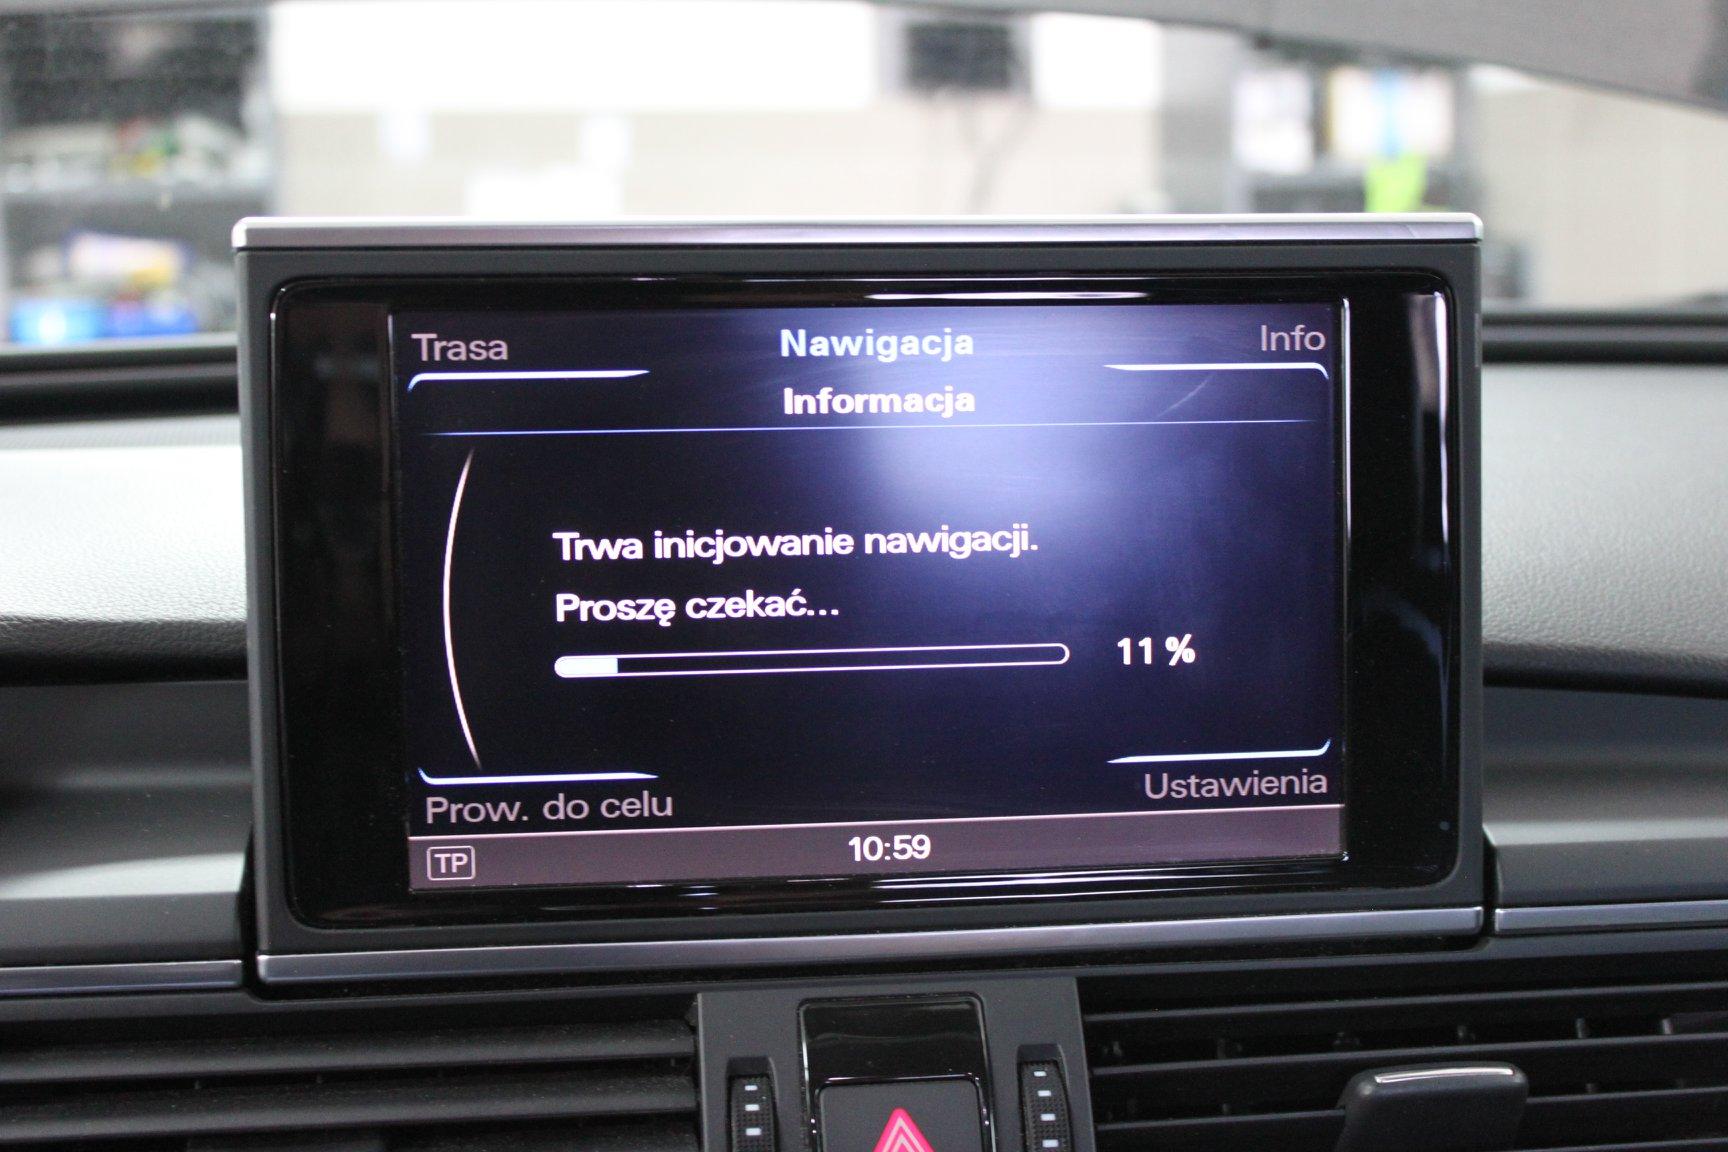 AUDI A6 C7 3.0 TFSI QUATTRO 2012